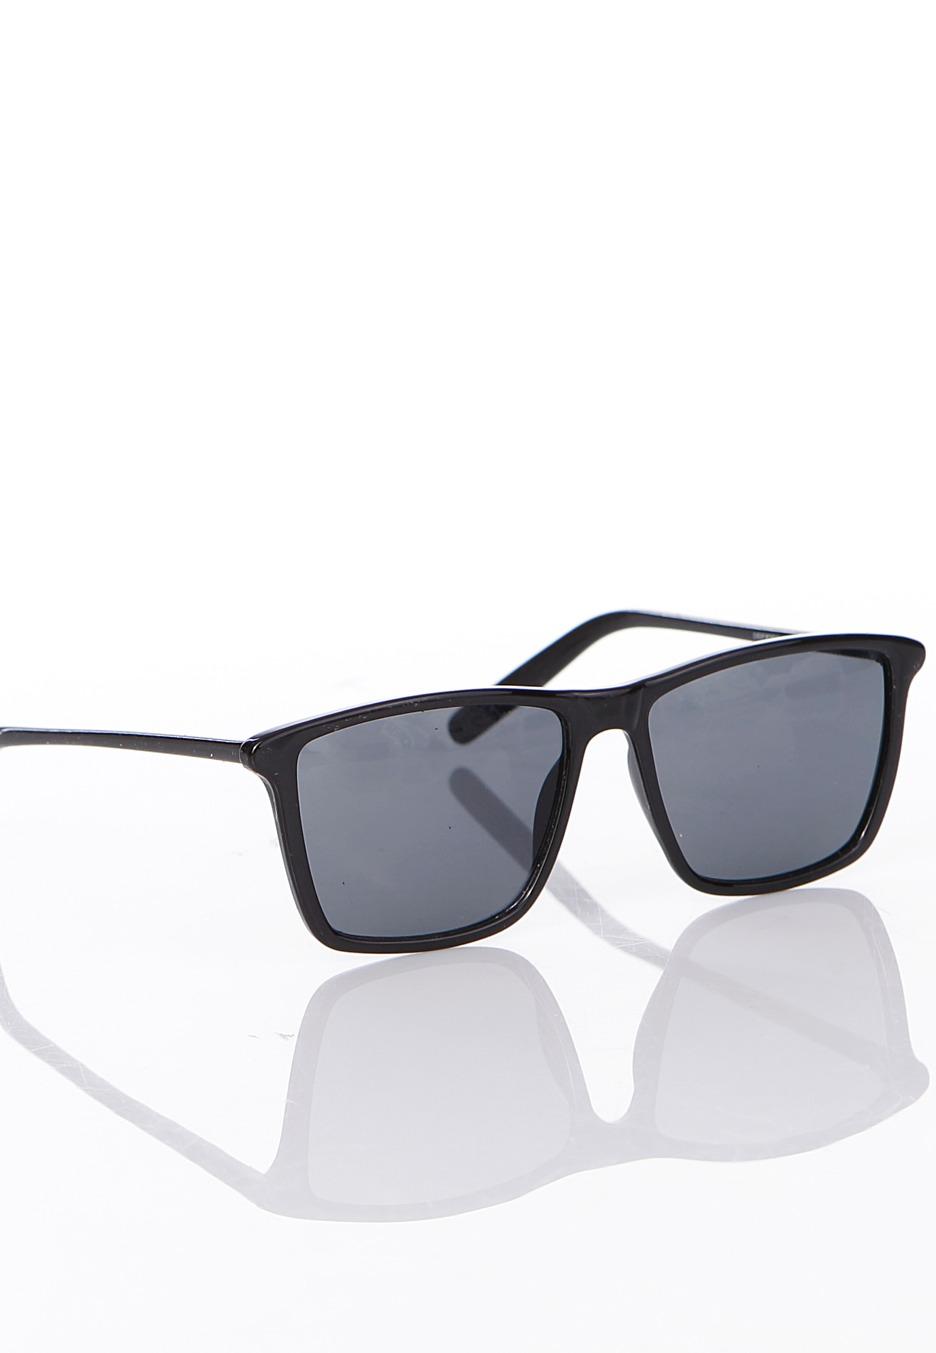 Sunglasses Cheap Black Pitch Monday Mars 4qjLAc3R5